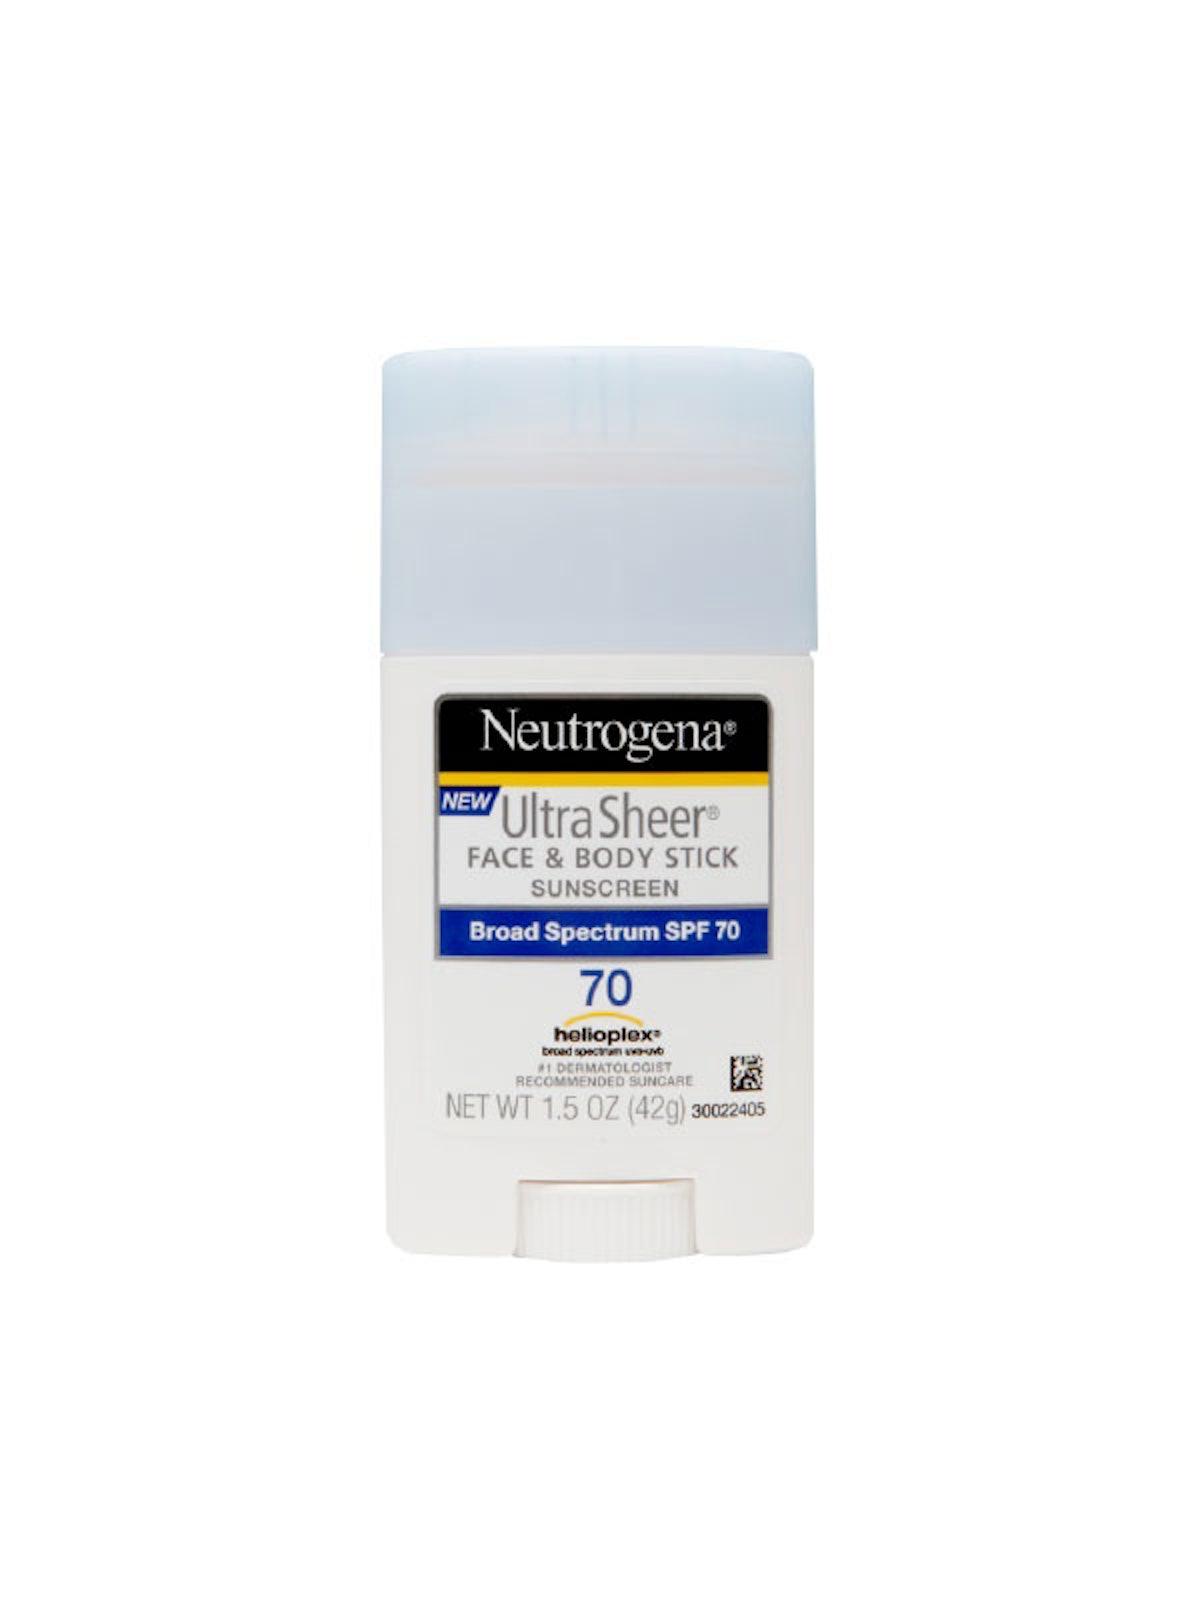 Neutrogena Ultra Sheer Face & Body Stick SPF 70